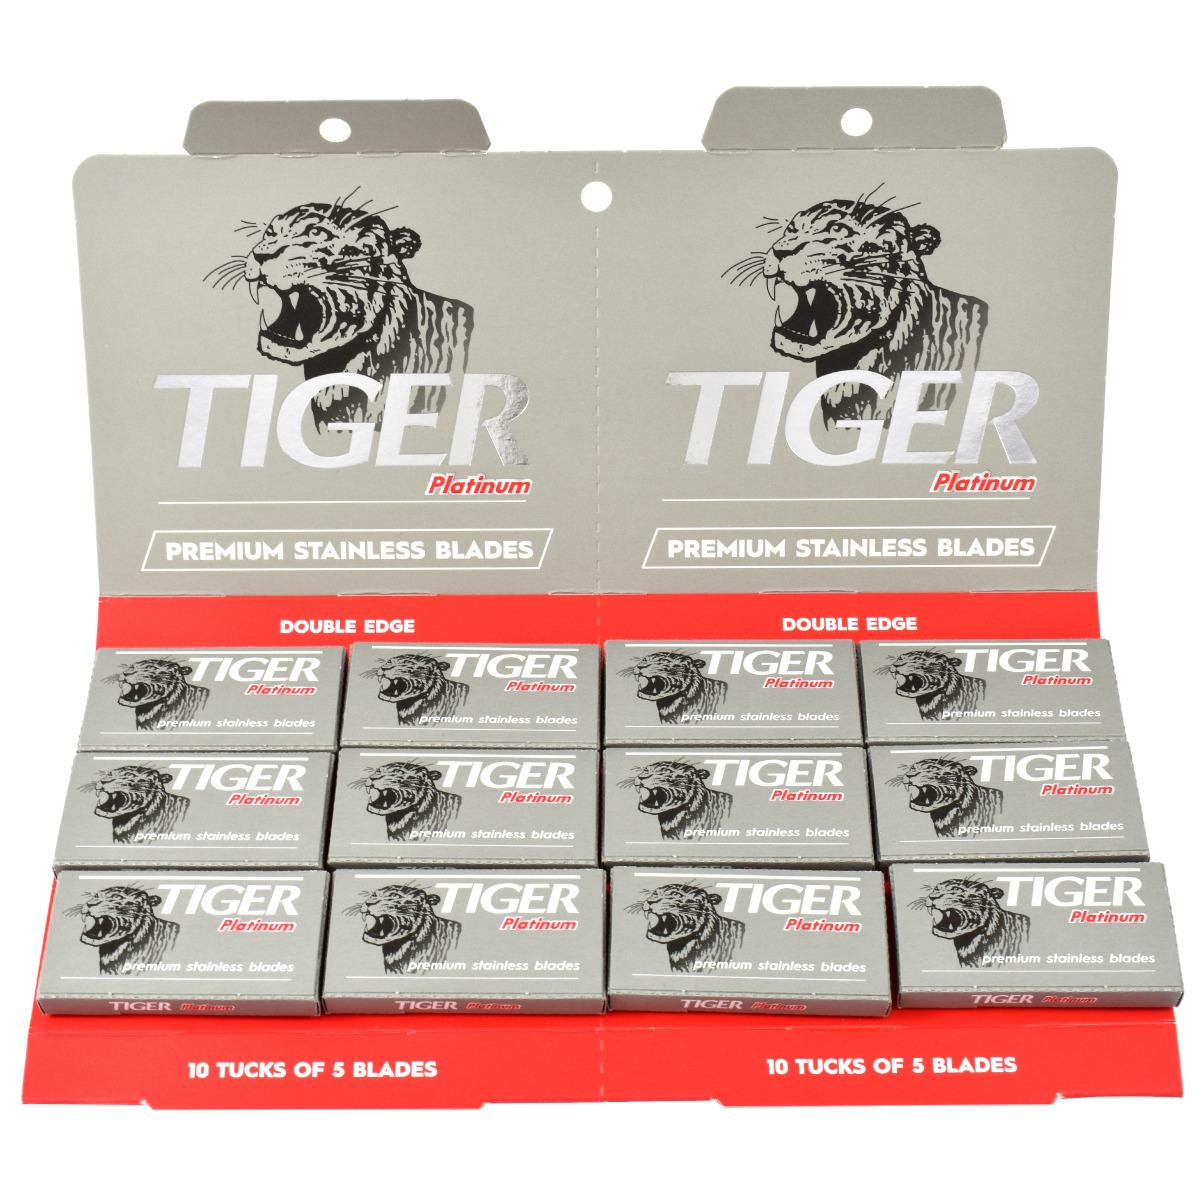 Tiger Platinum 100 Safety Razor Blades Trade Pack